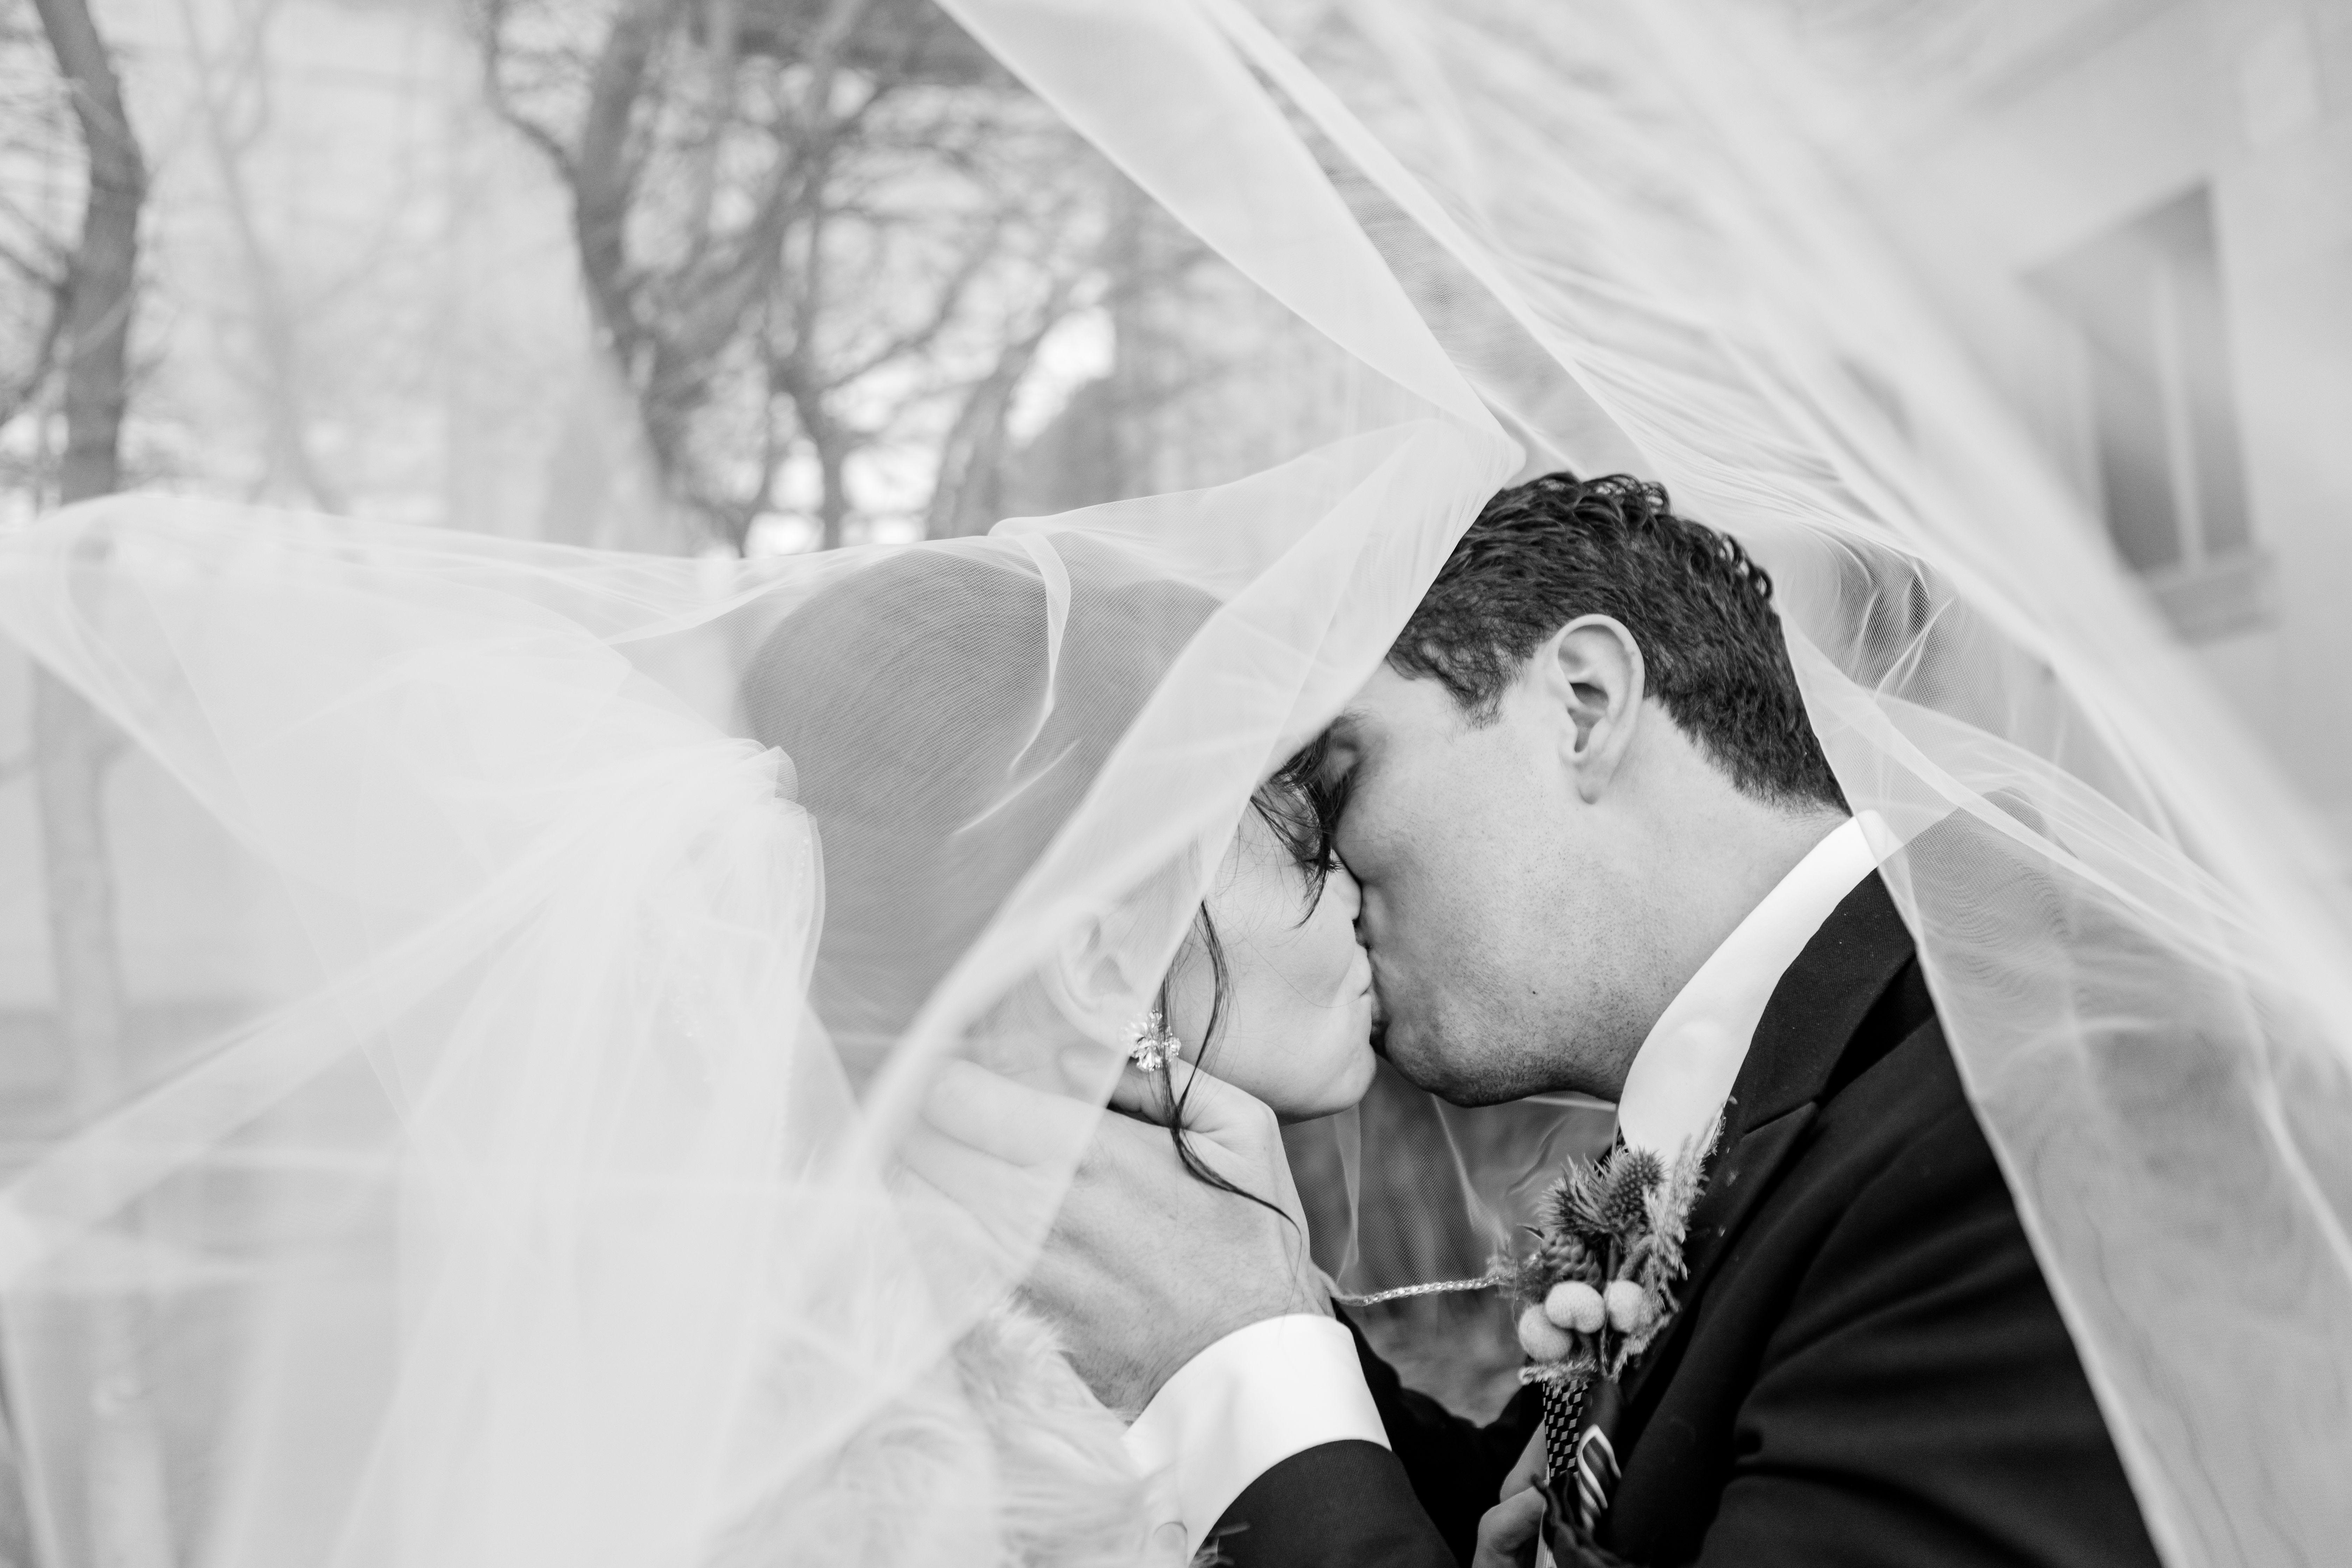 Winter Wedding Cincinnati Wedding Photography Kaleigh Turner Photography F In 2020 Cincinnati Wedding Photographers Cincinnati Weddings Ohio Wedding Photographer